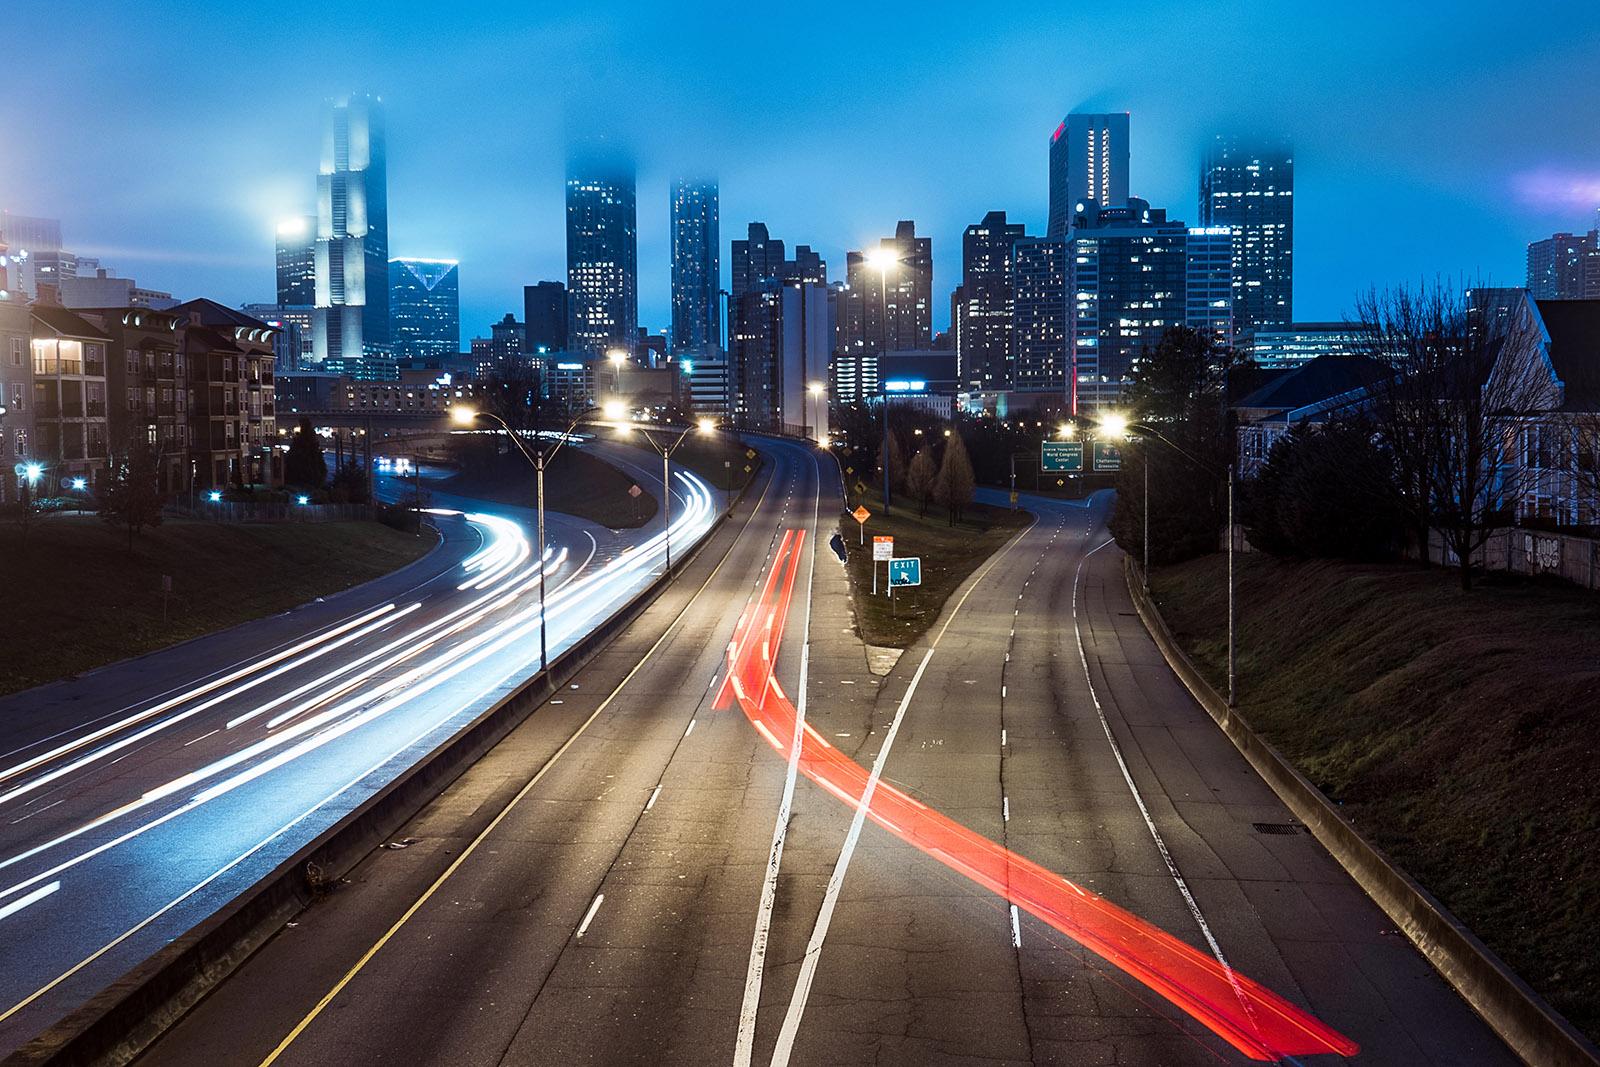 Dans les rues d'Atlanta, la ville labyrinthe